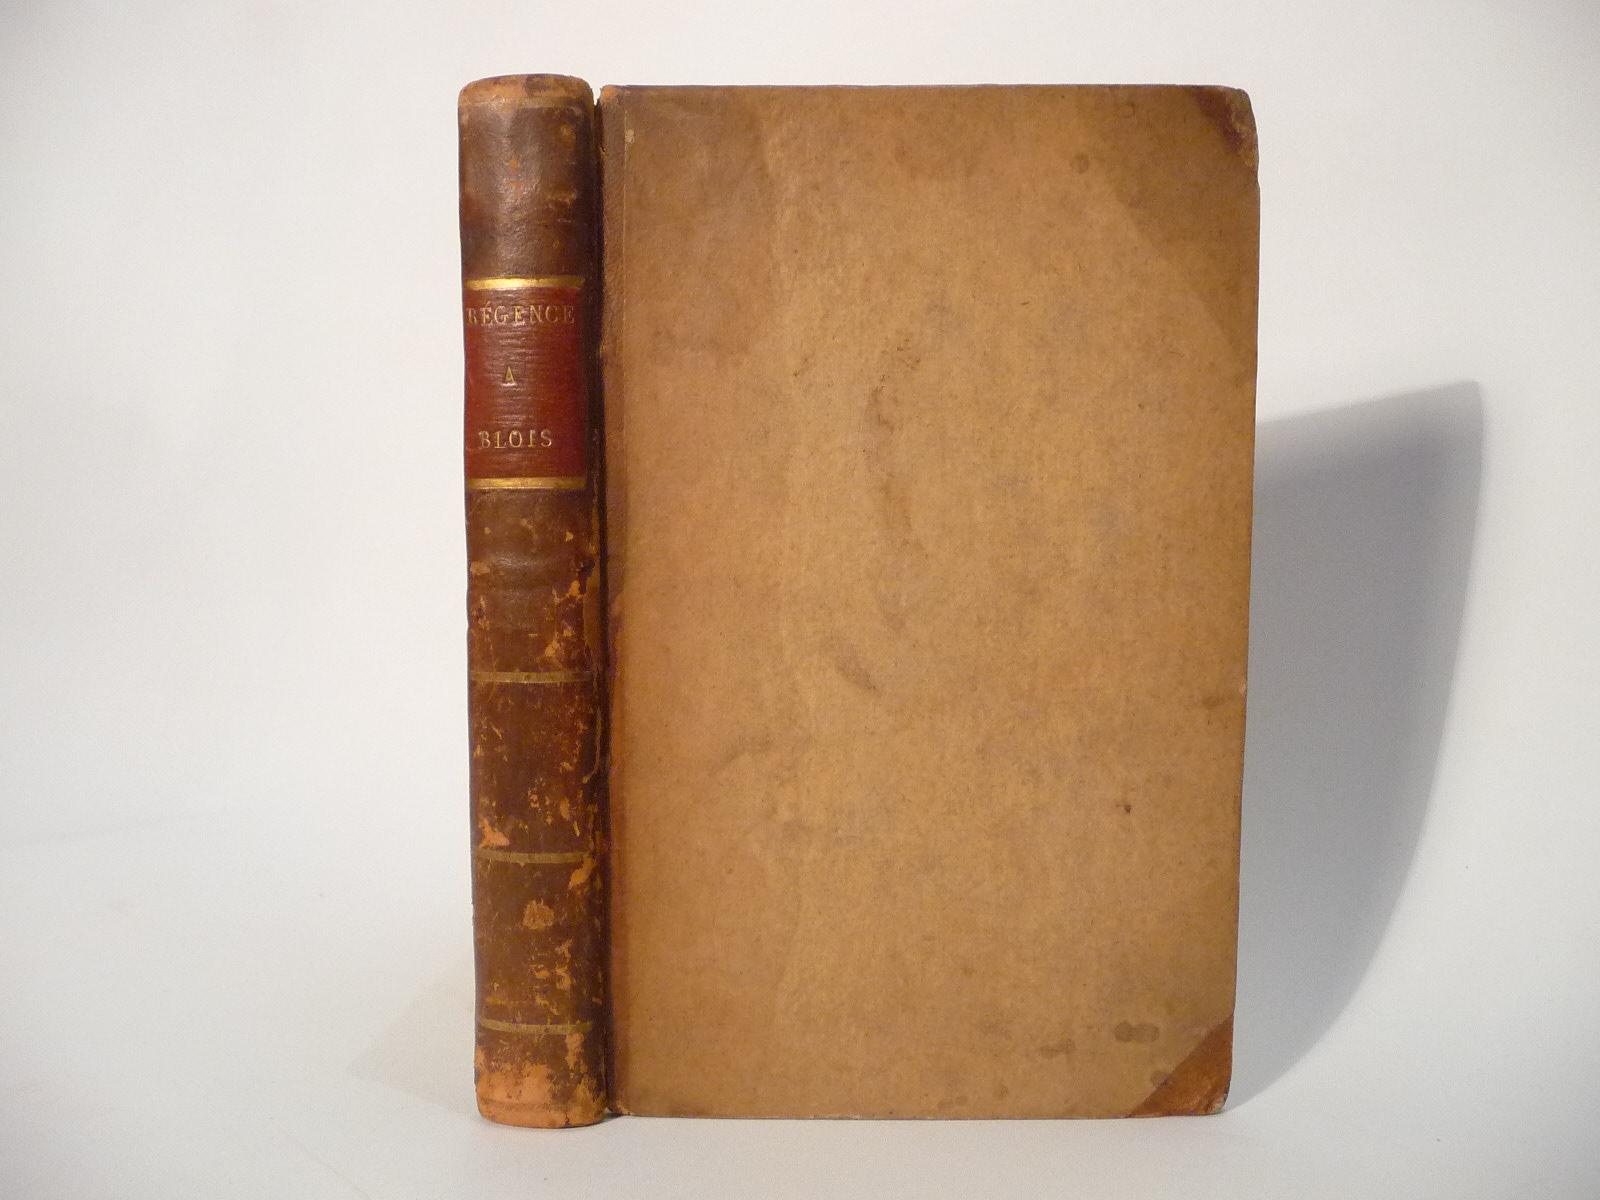 La revue napoleon zvab